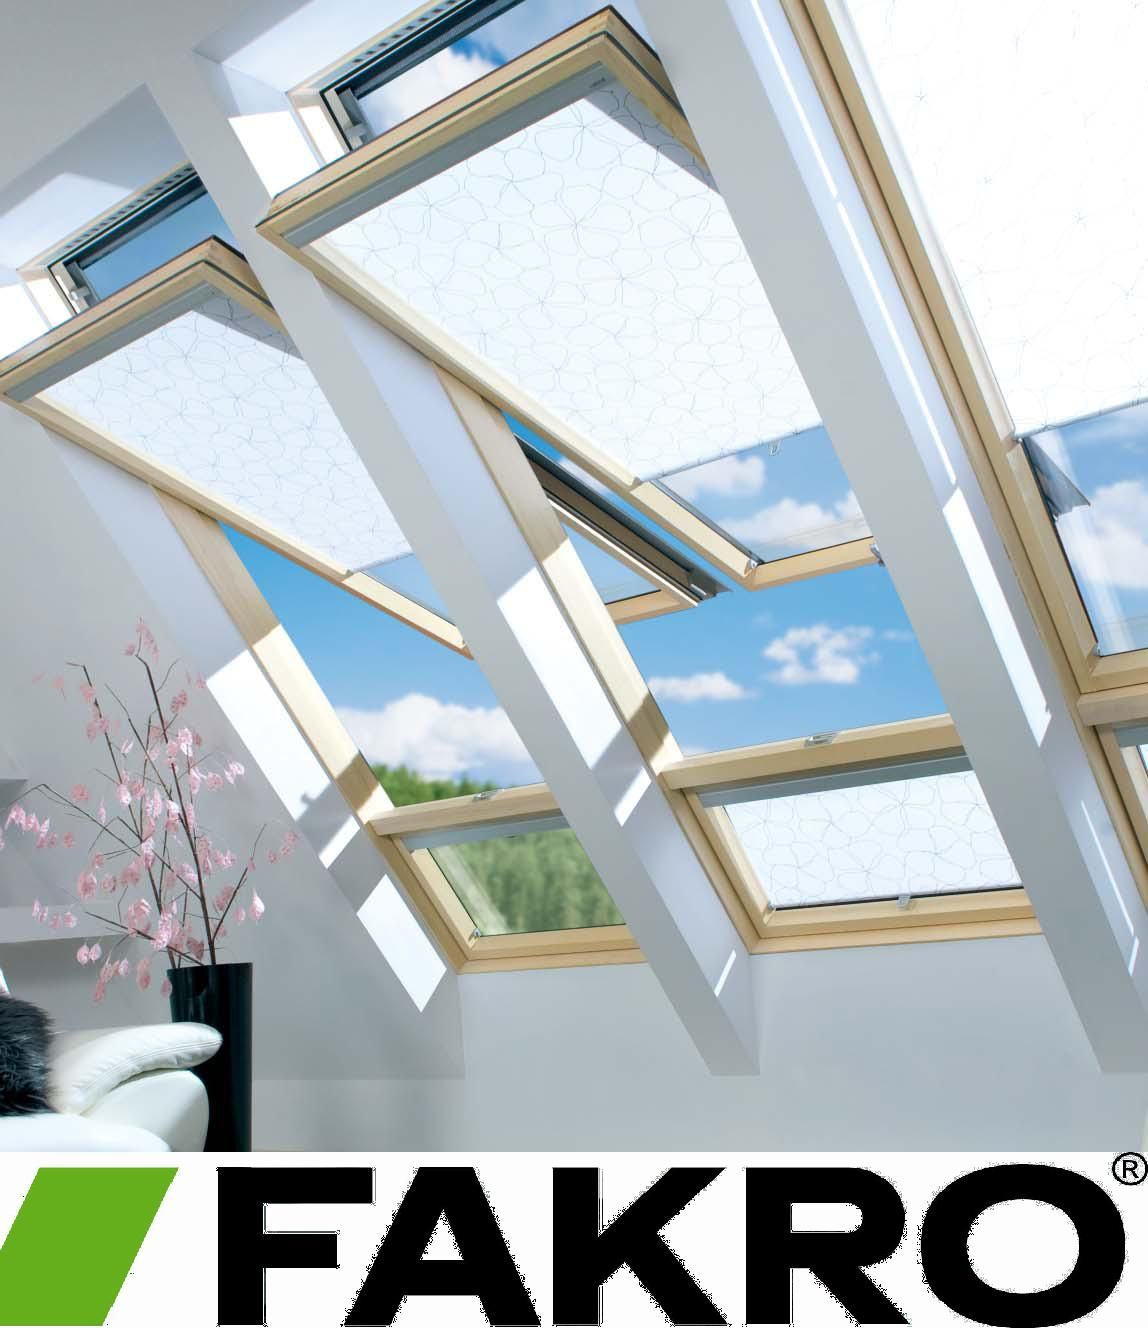 fakro design idea. Fakro Roof Windows - Triple And Quadruple Glazed Design Idea